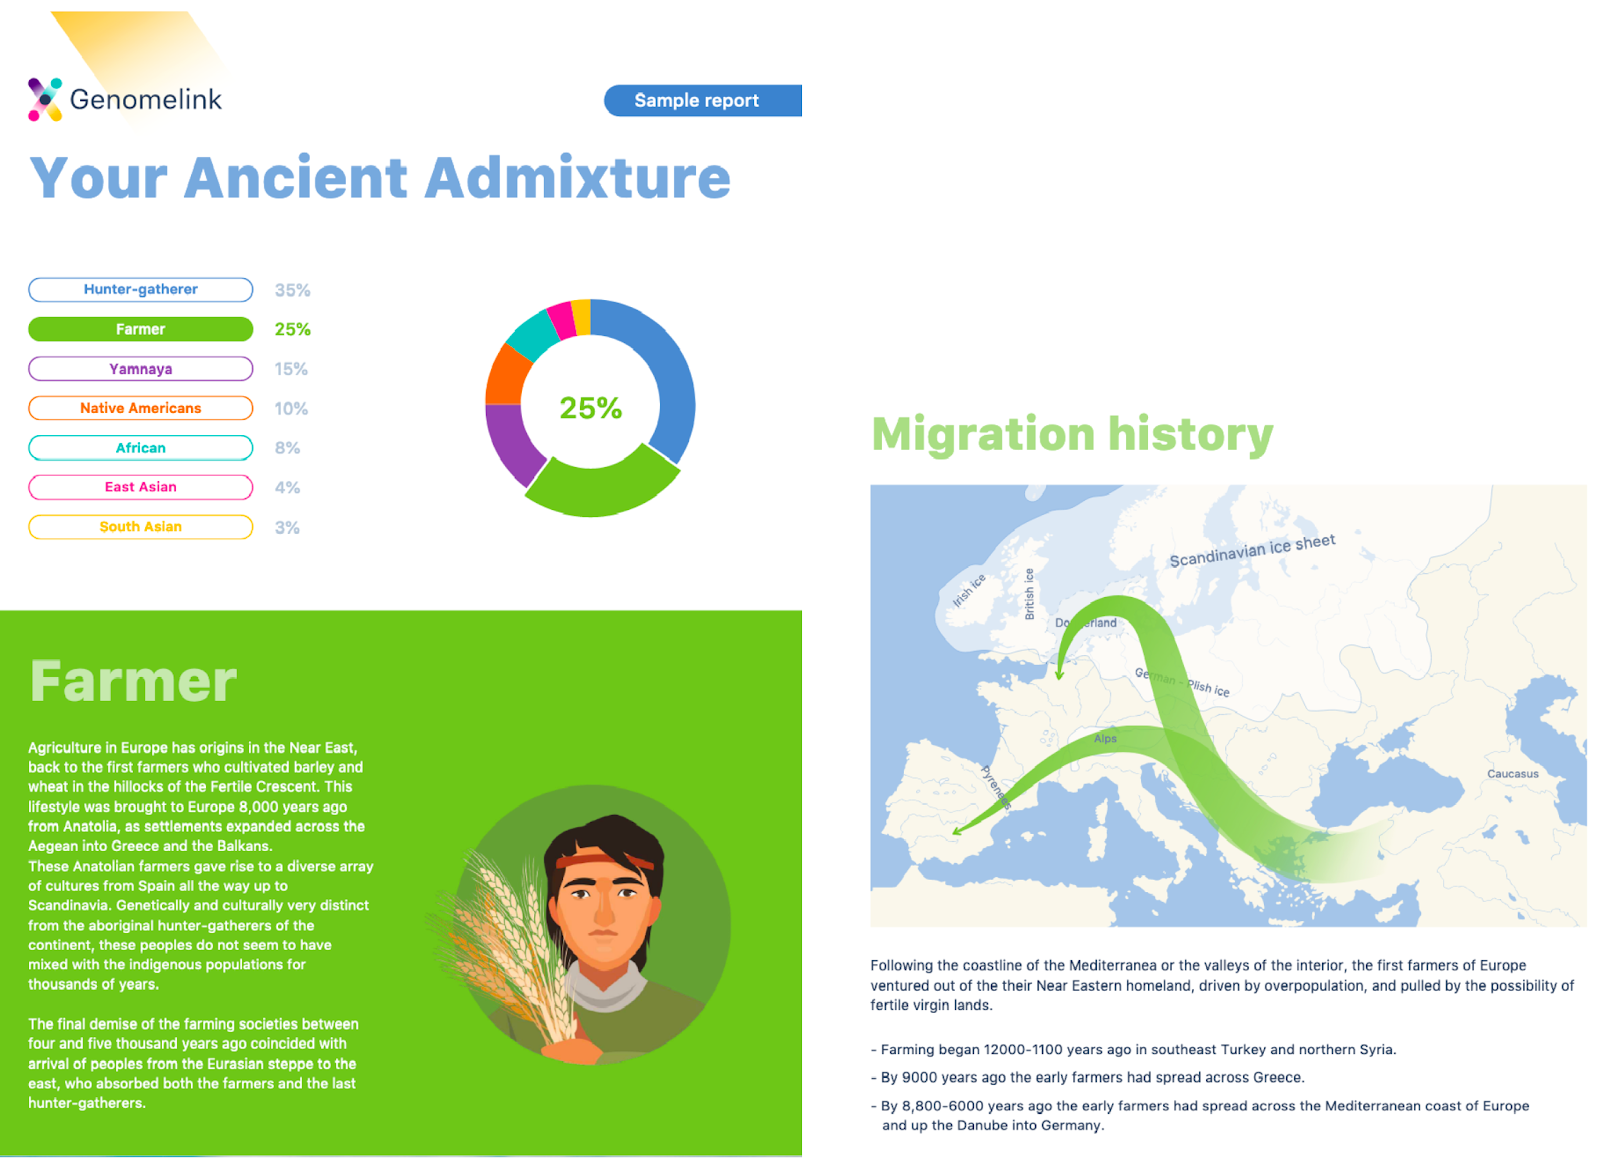 Genomelink Ancient Admixture ، بما في ذلك تاريخ الهجرة